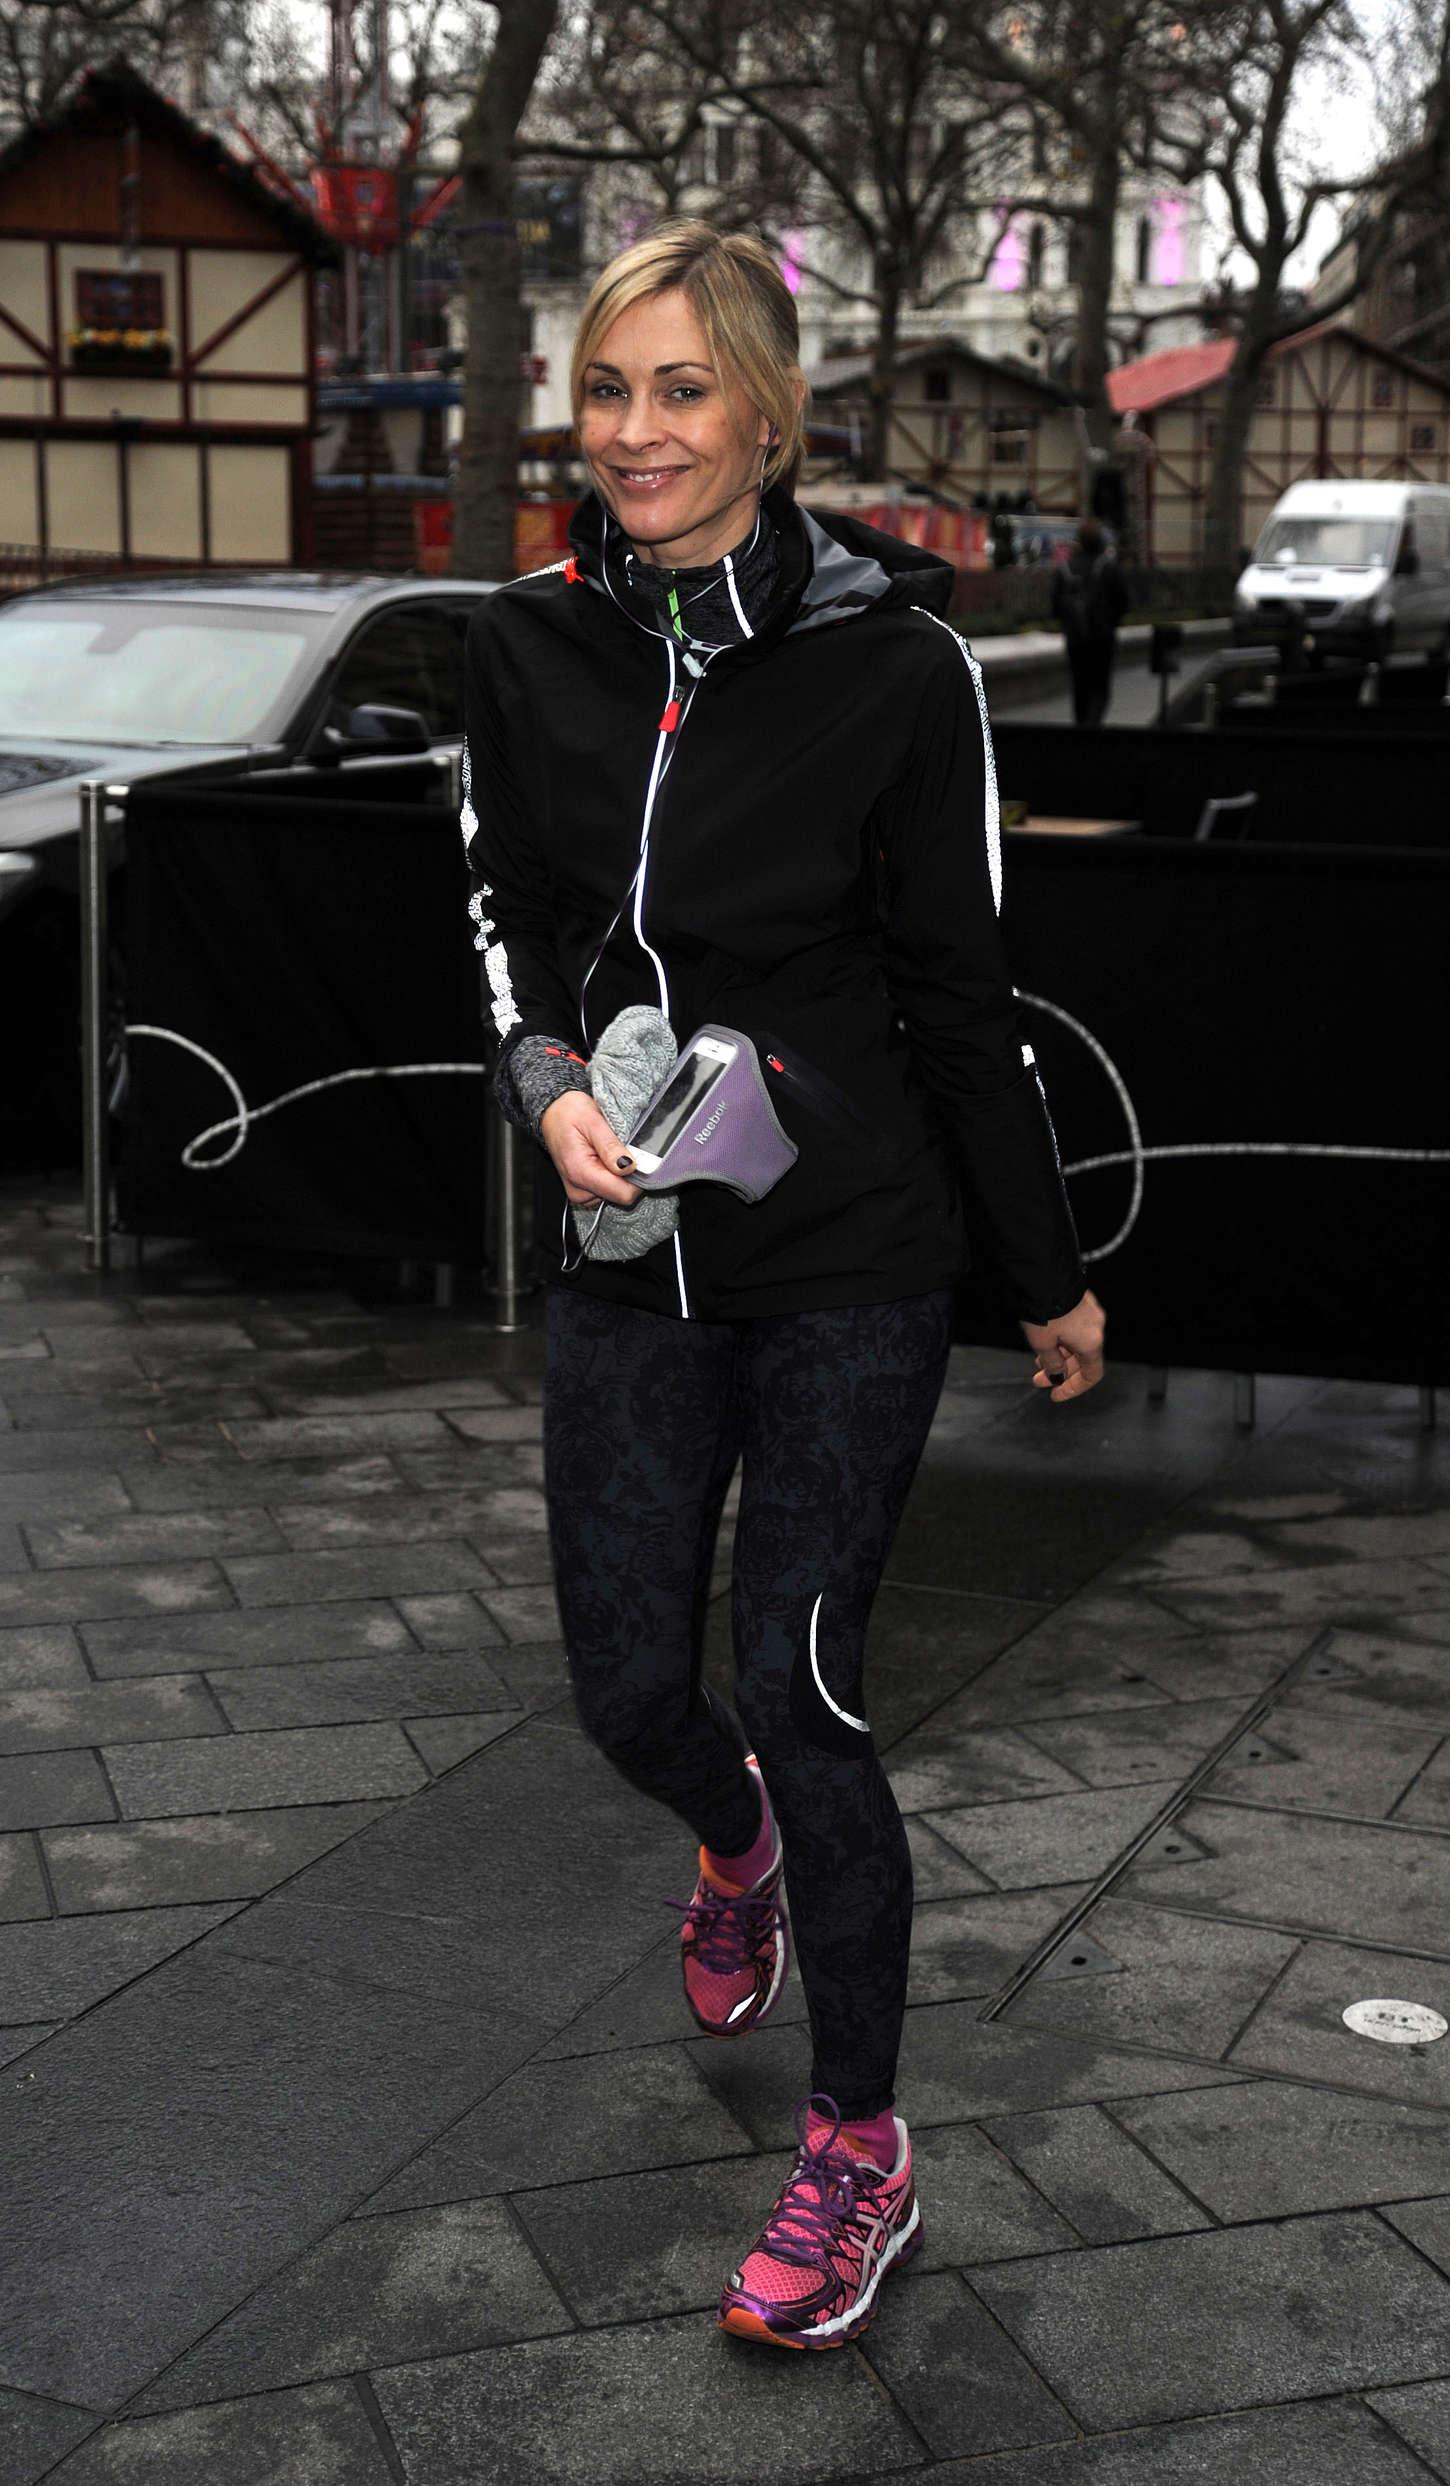 Jenni Falconer in Leggings Out Jogging in London